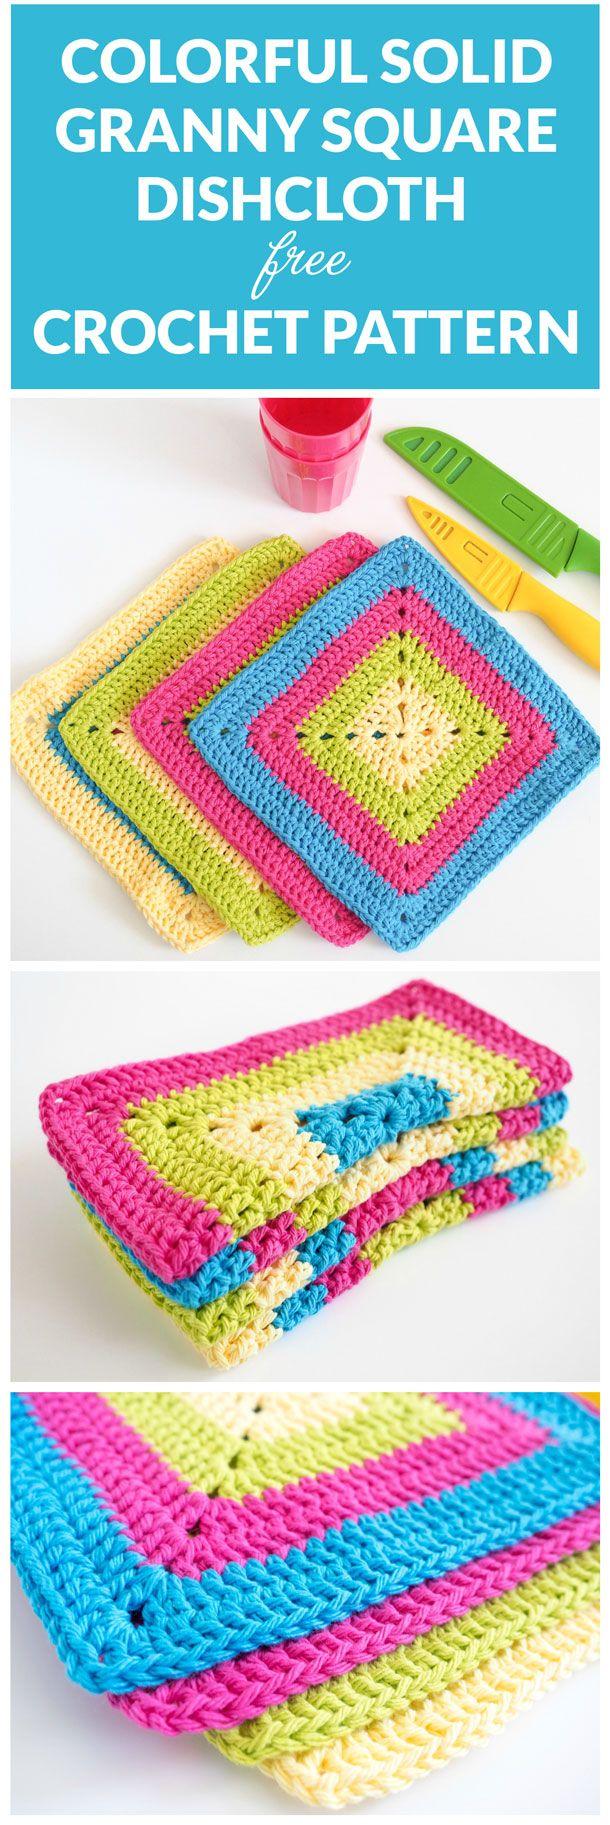 Colorful Solid Granny Square Dishcloth Crochet Pattern   Colores ...